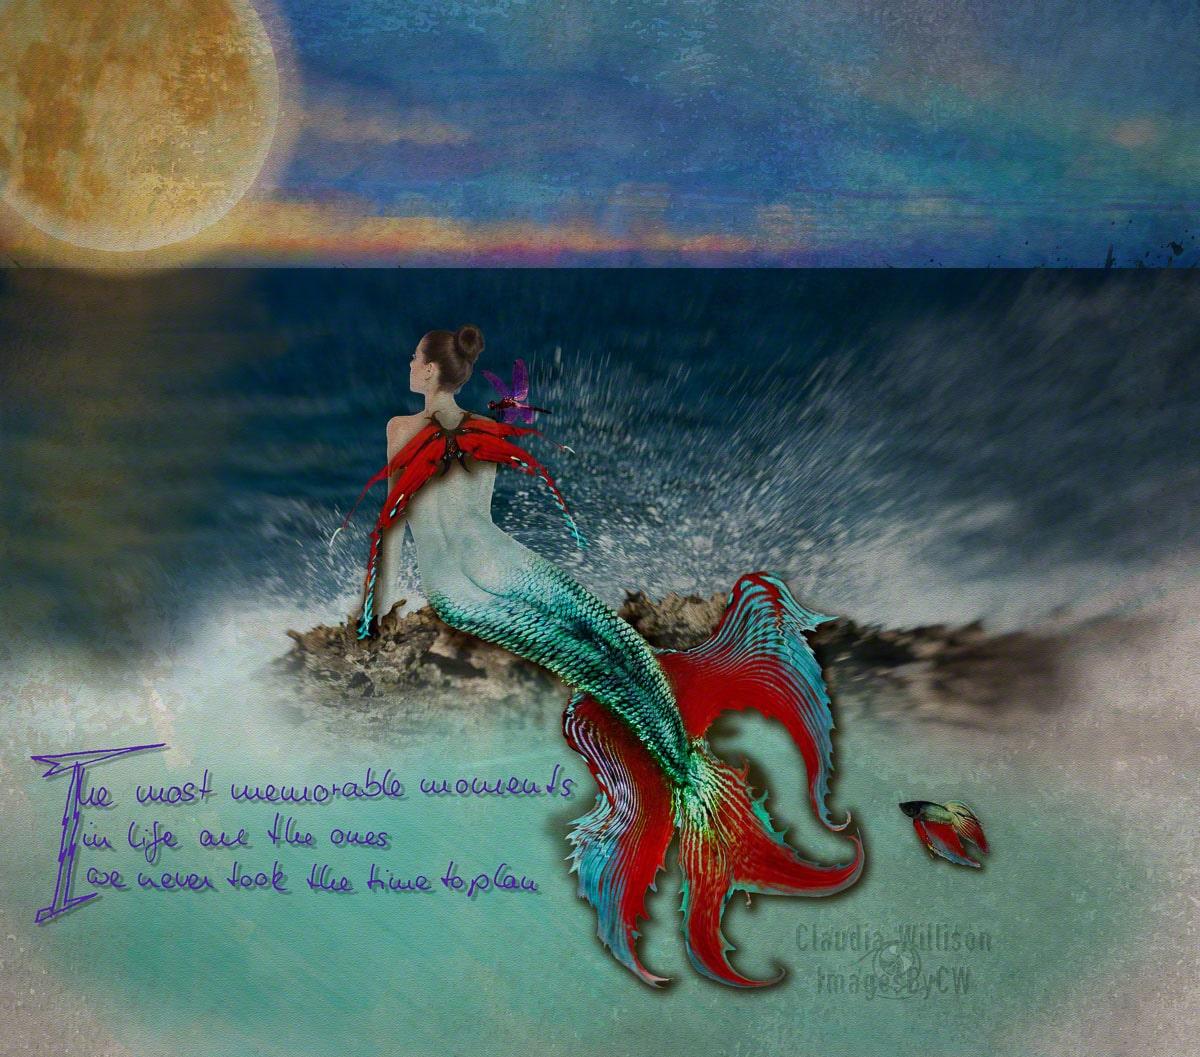 quote, mermaid, moments